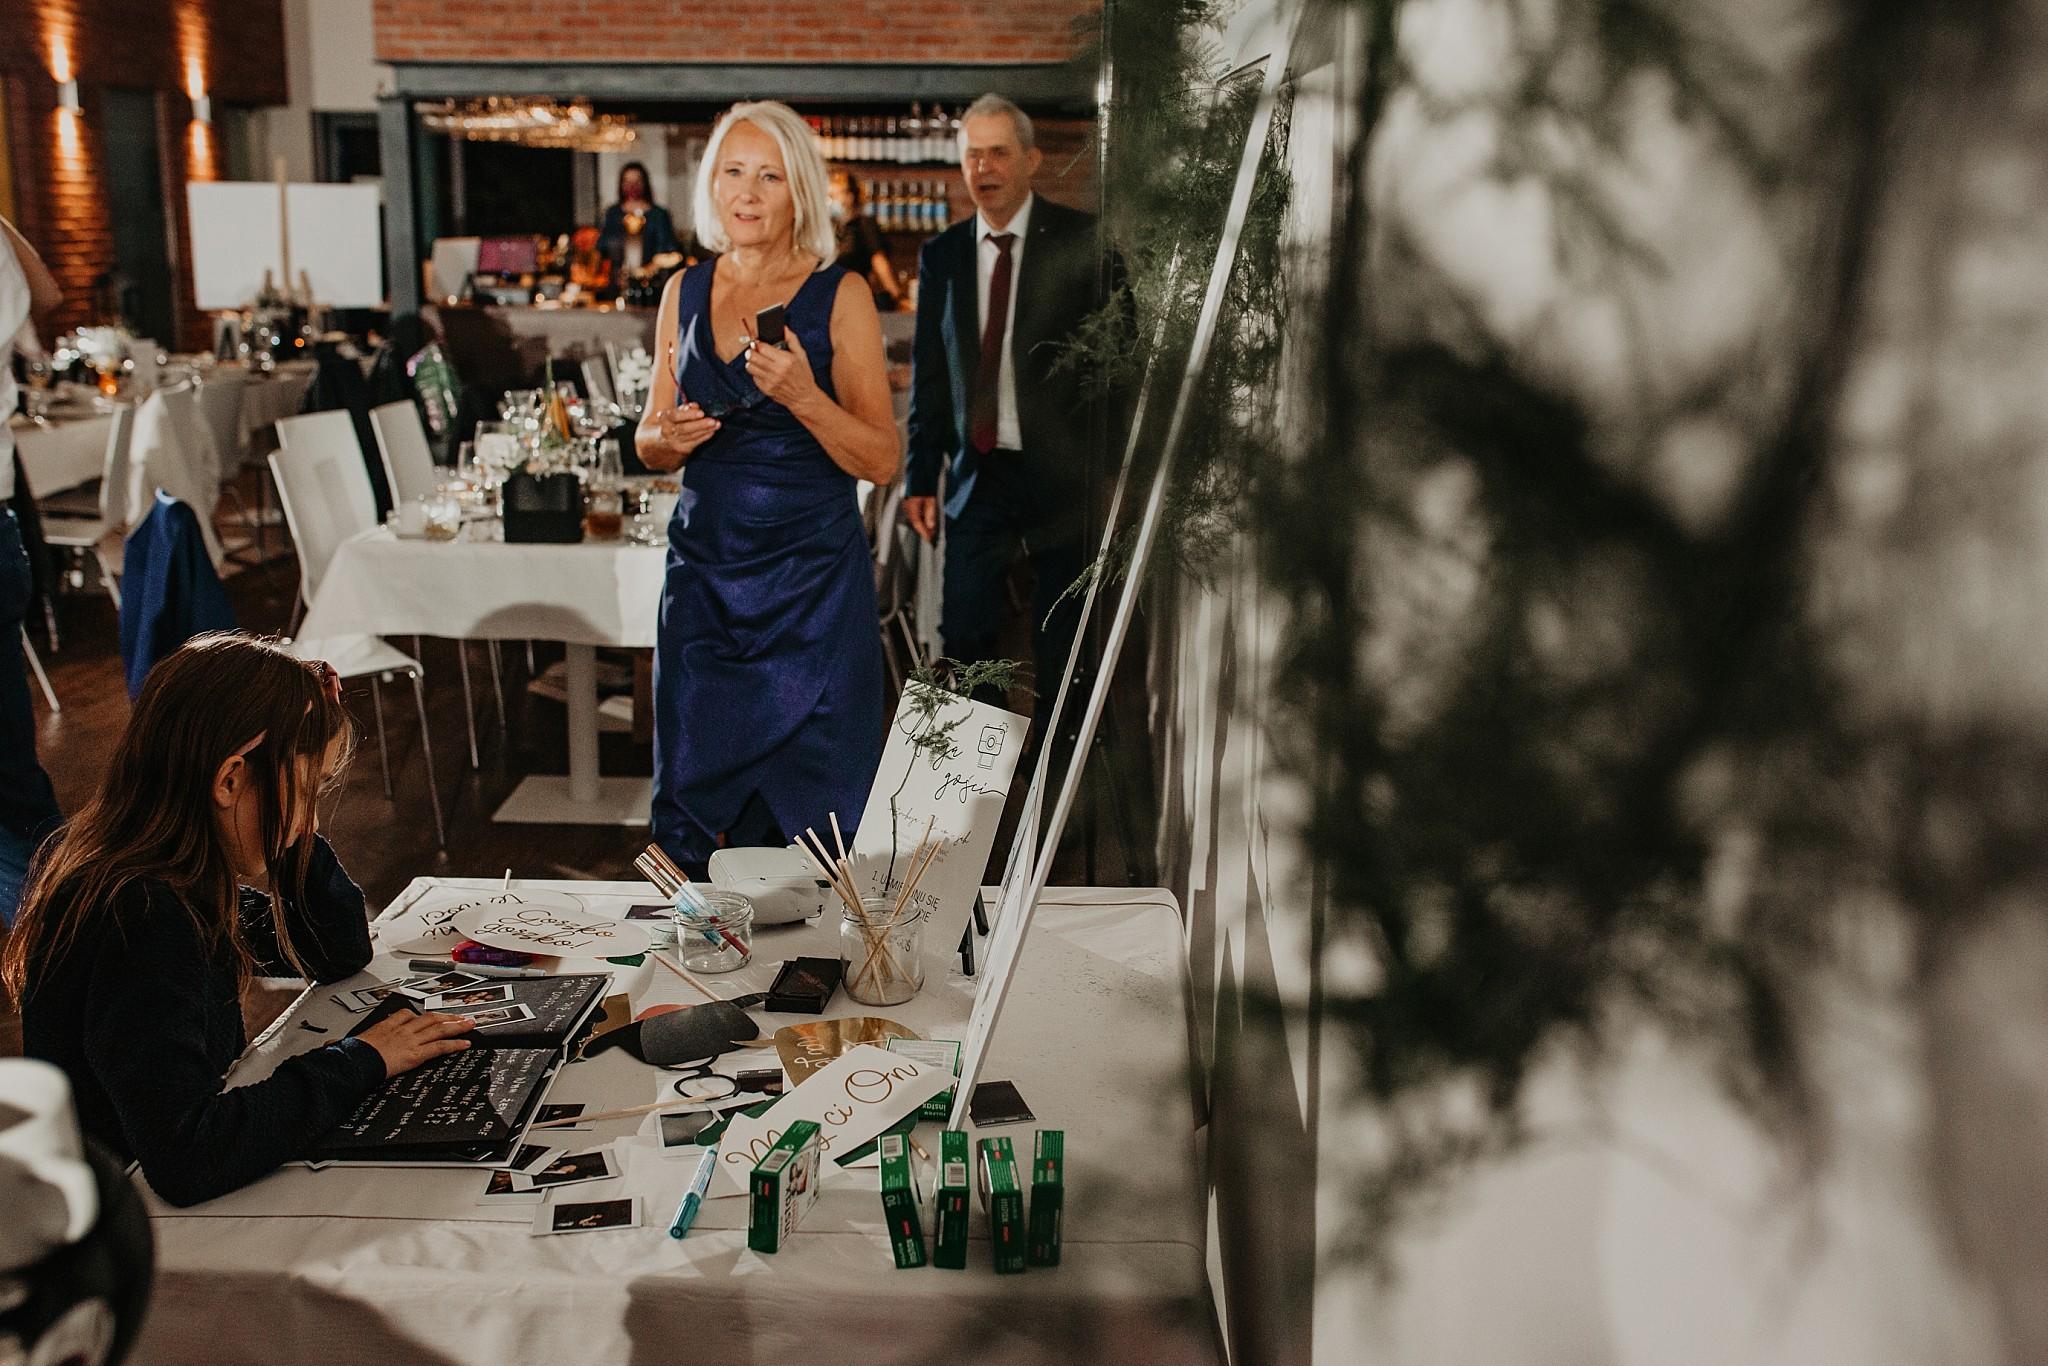 fotograf poznan wesele dobra truskawka piekne wesele pod poznaniem wesele w dobrej truskawce piekna para mloda slub marzen slub koronawirus slub listopad wesele koronawirus 482